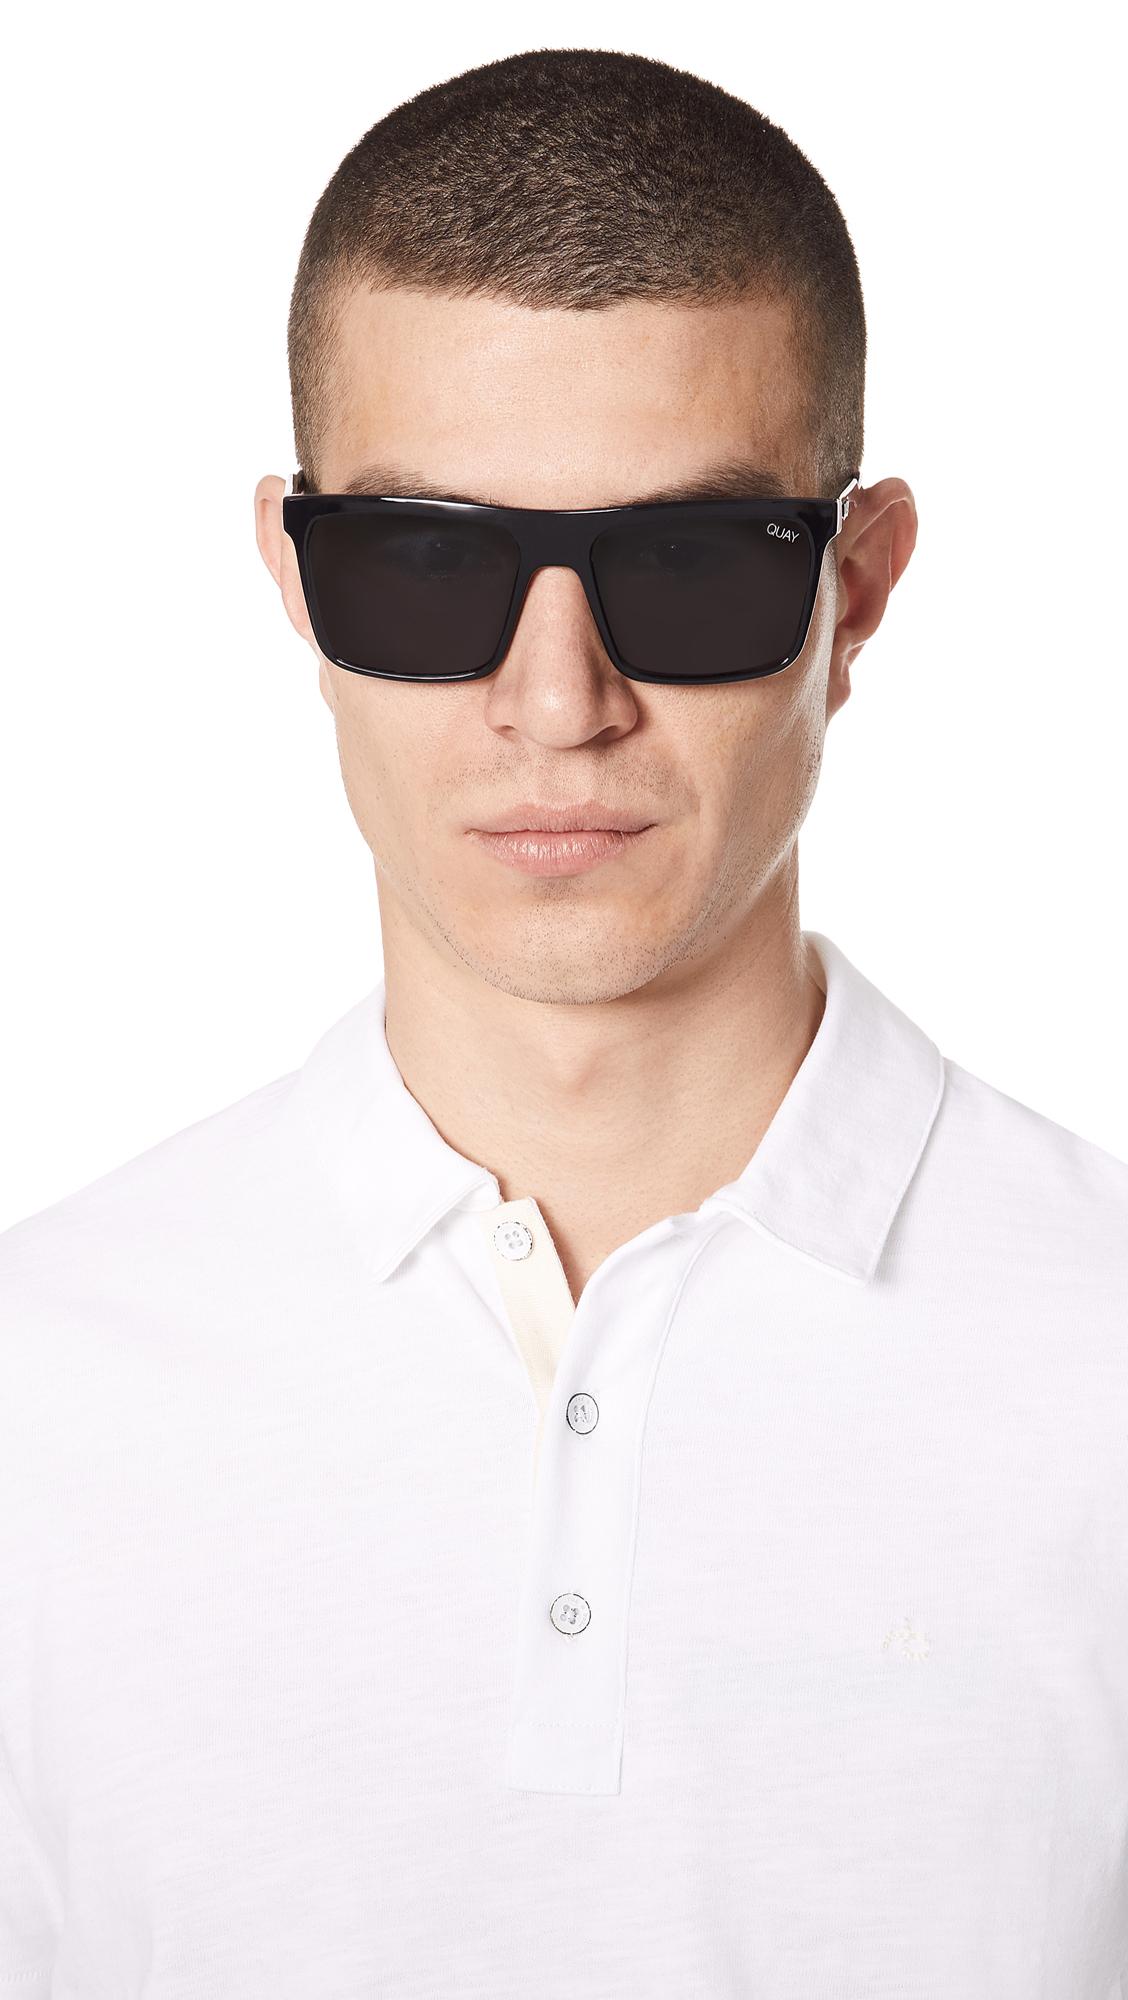 8bfe0366b1ce8 Quay Let It Run Sunglasses